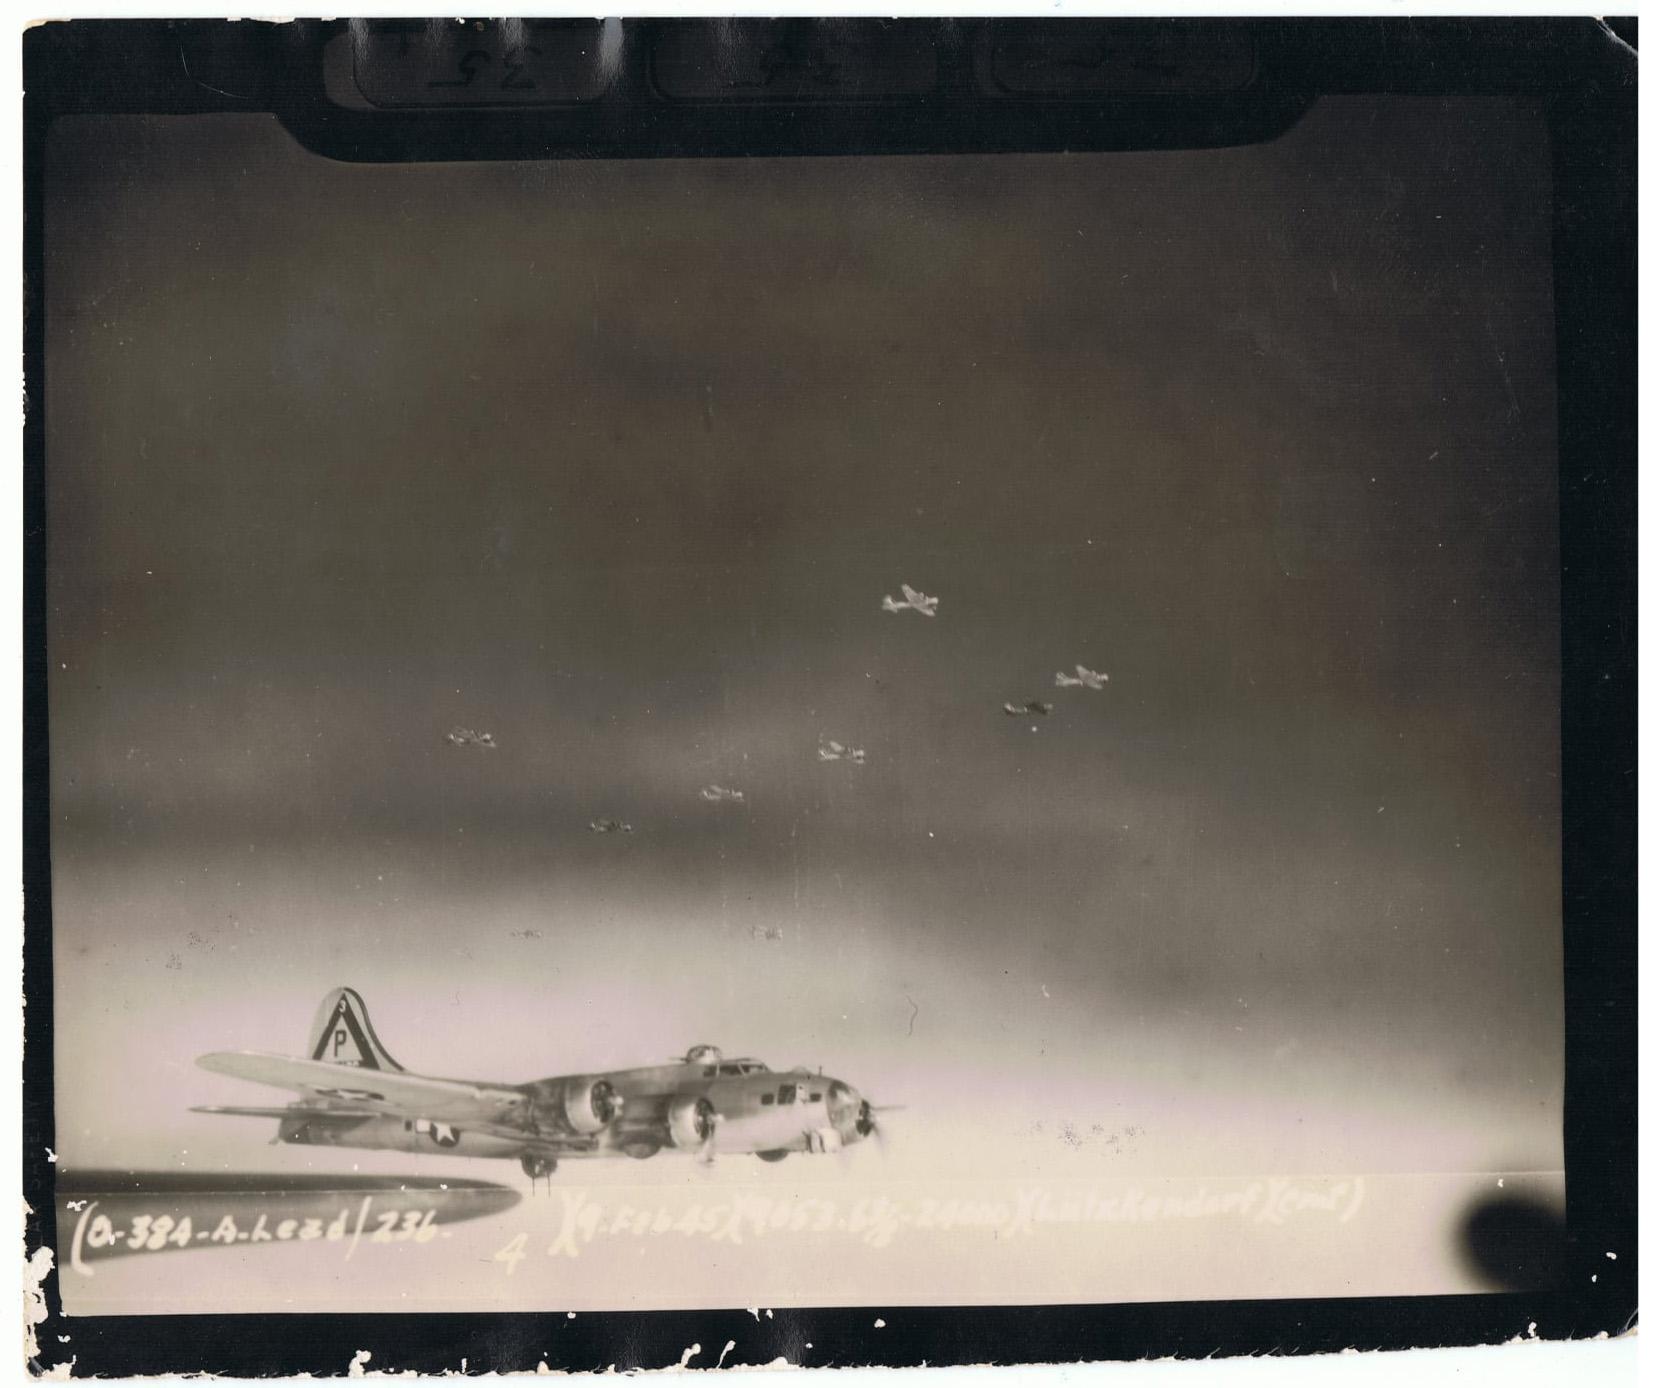 B-17 #44-6476